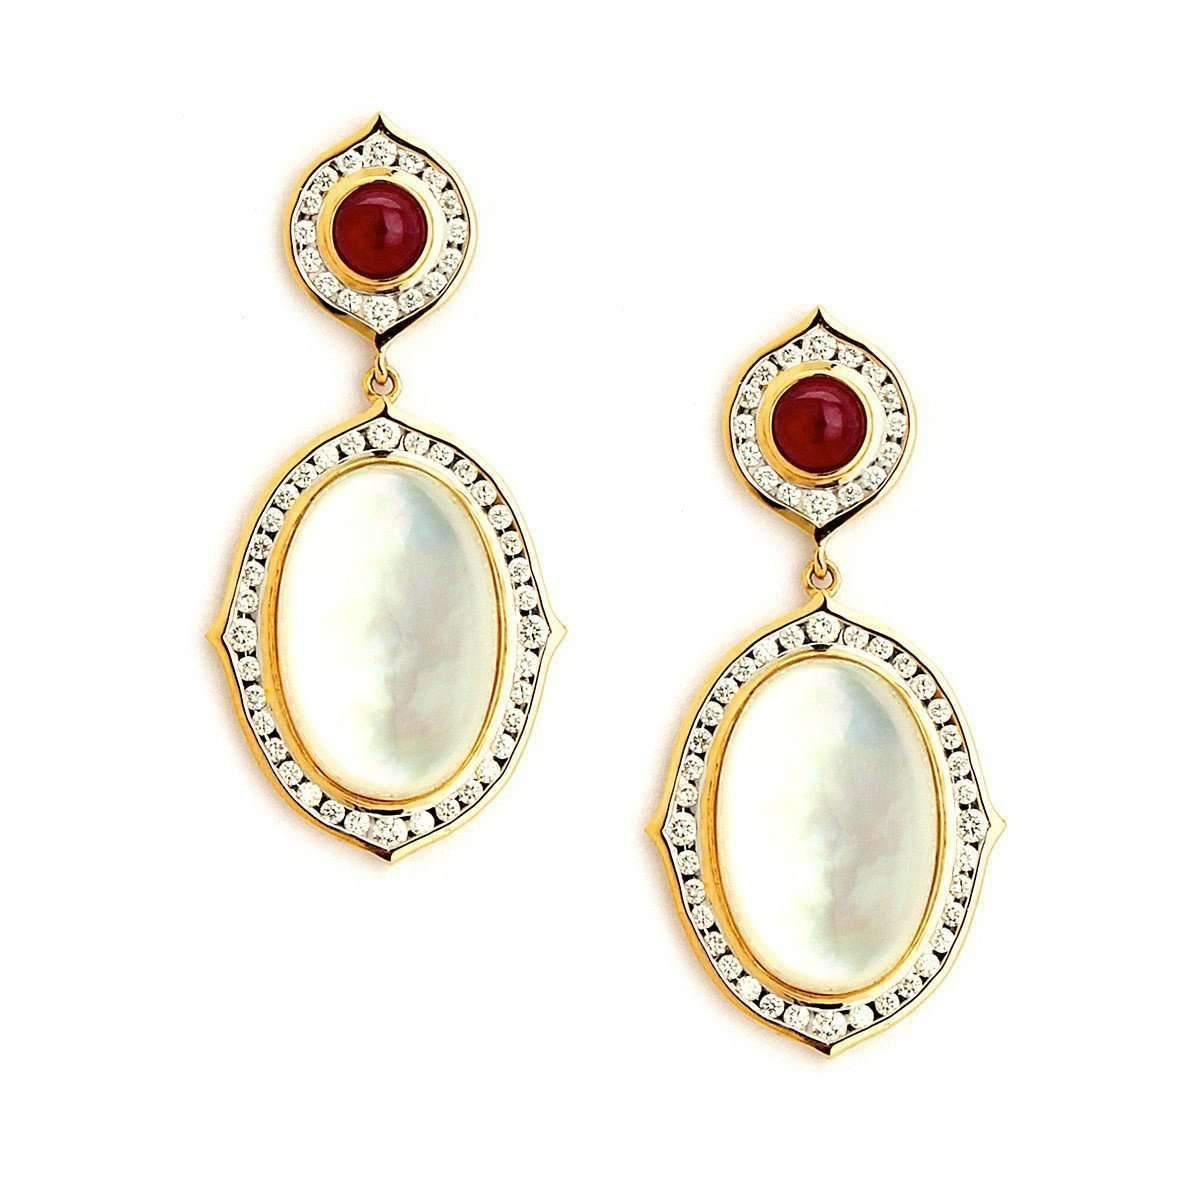 Syna 18kt Moon Quartz & Emerald Earrings With Diamonds c1RpSMu7k